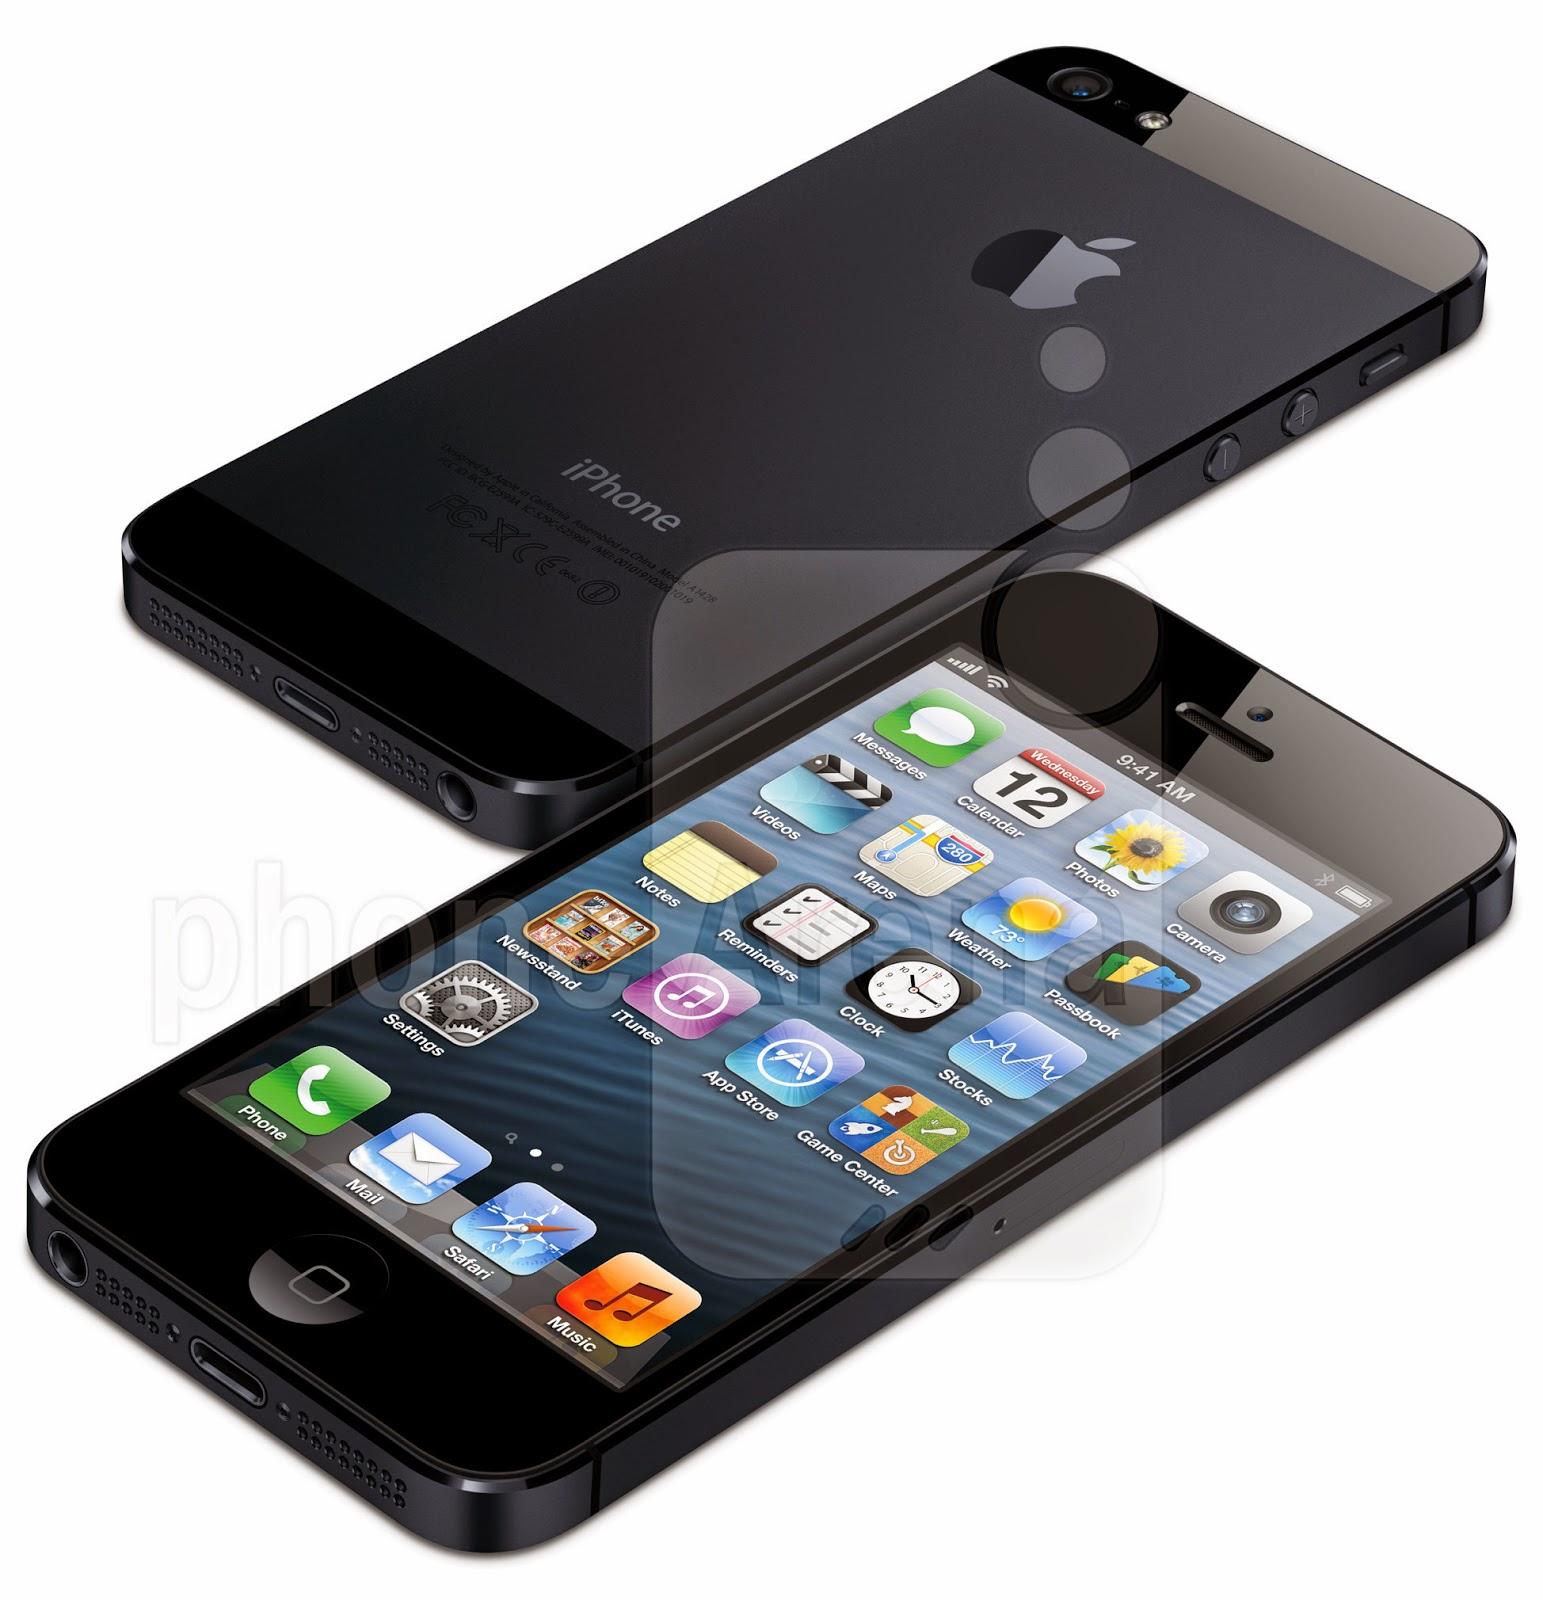 iphone price - 28 images - iphone 4 price drop gizchina, apple iphone 5s iphone 5c prices in ...